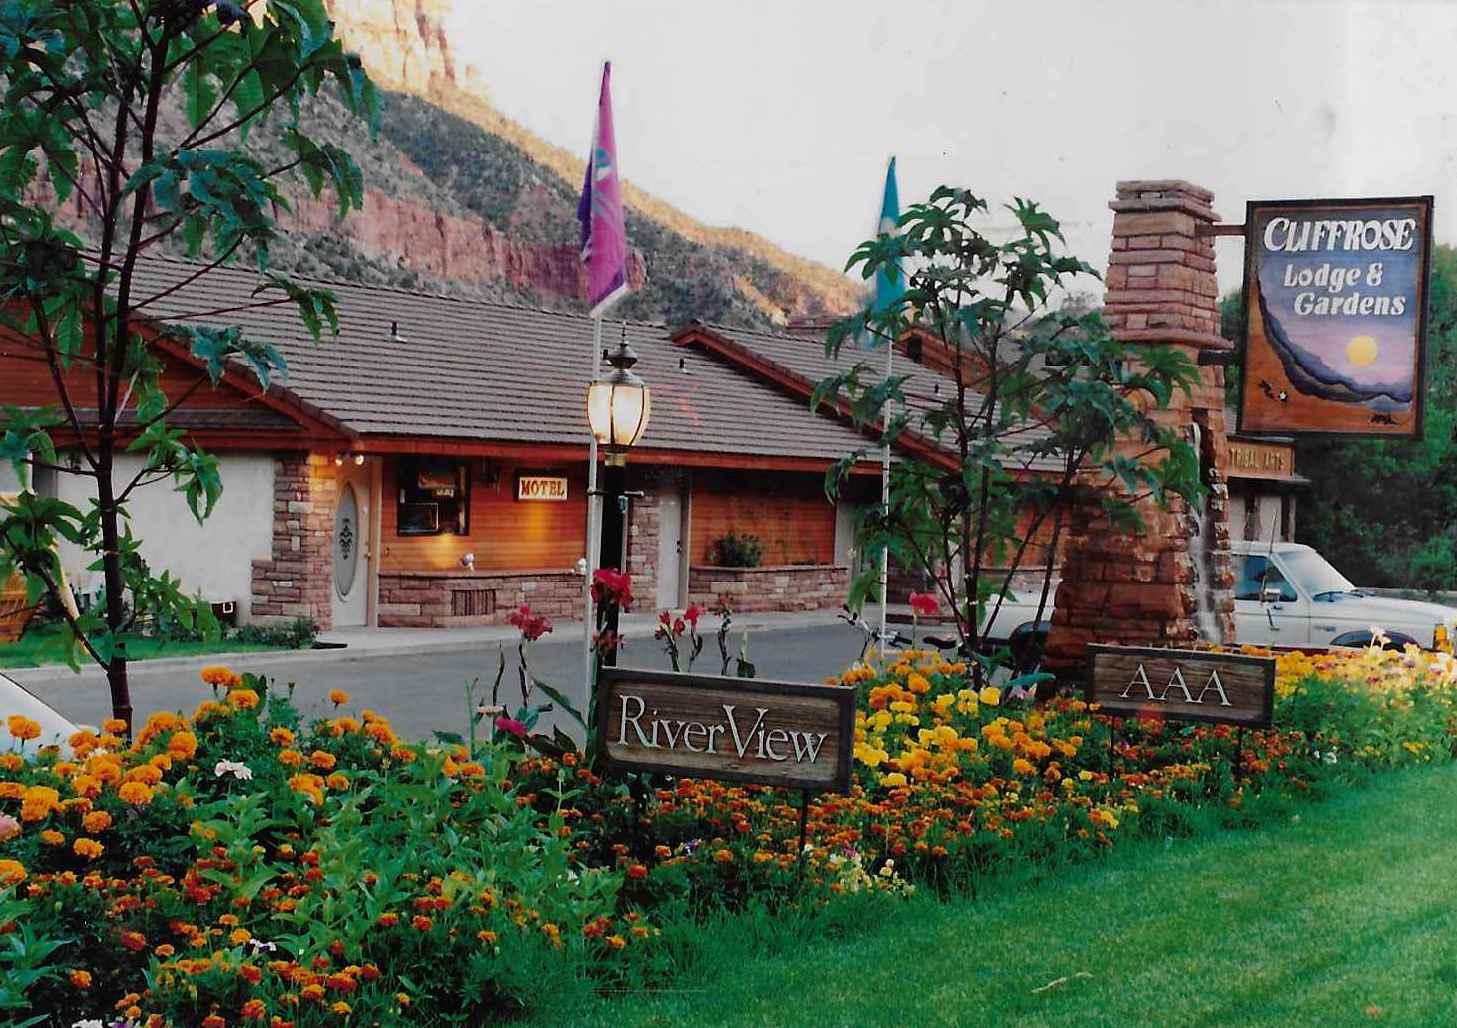 This 1991 Photos Shows The Entrance To The Cliffrose Lodge U0026 Gardens,  Springdale, Utah, Circa 1991 | Photo Courtesy Of The Cliffrose Lodge U0026  Gardens, ...